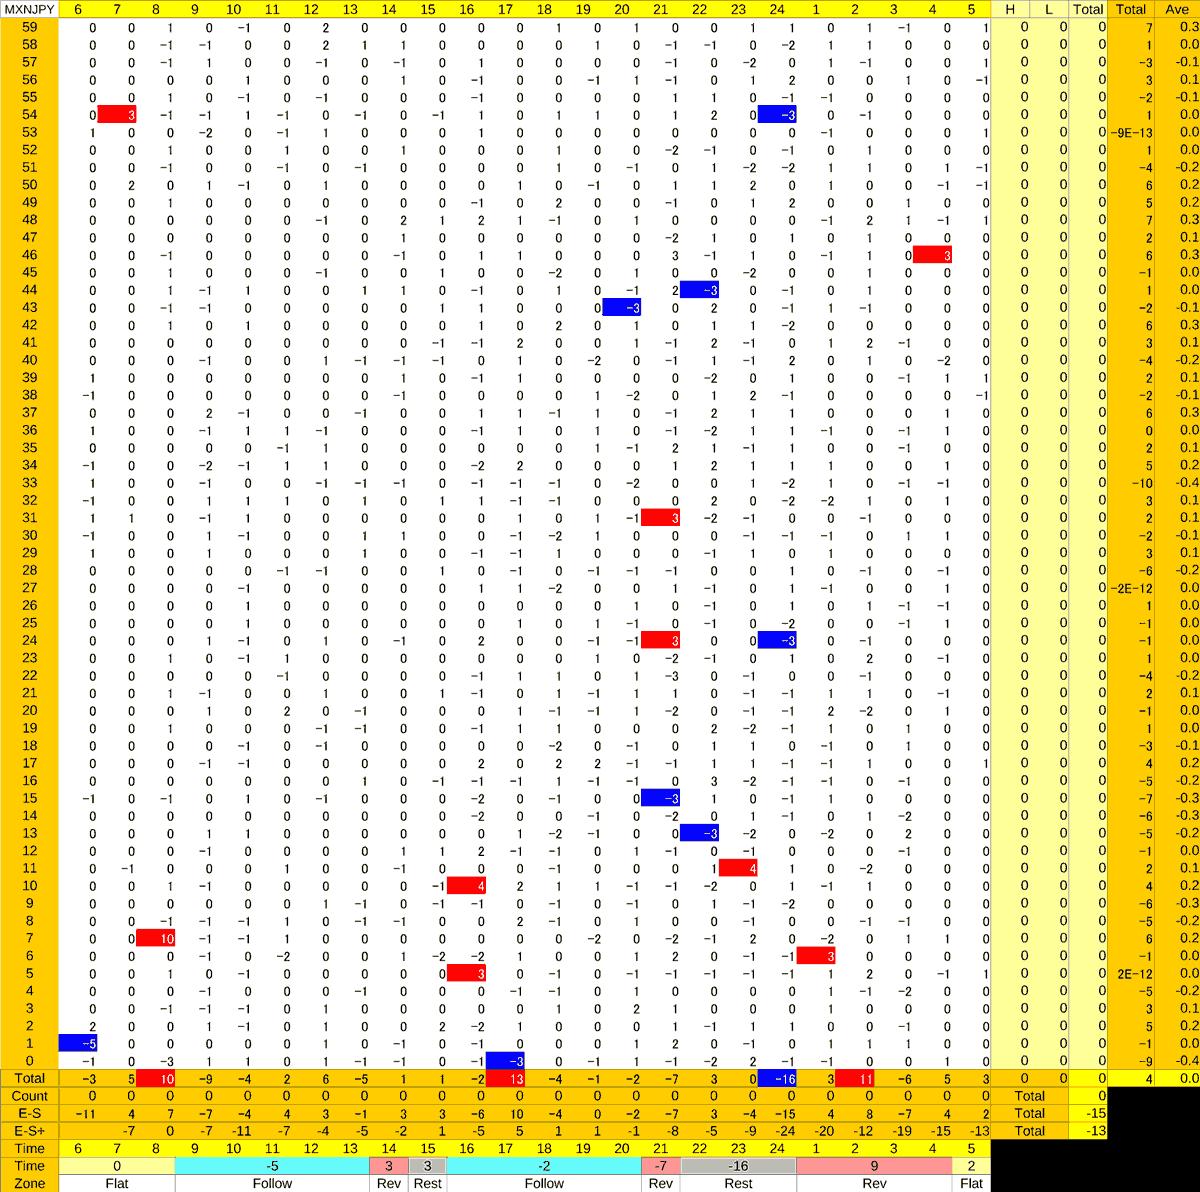 20201127_HS(3)MXNJPY